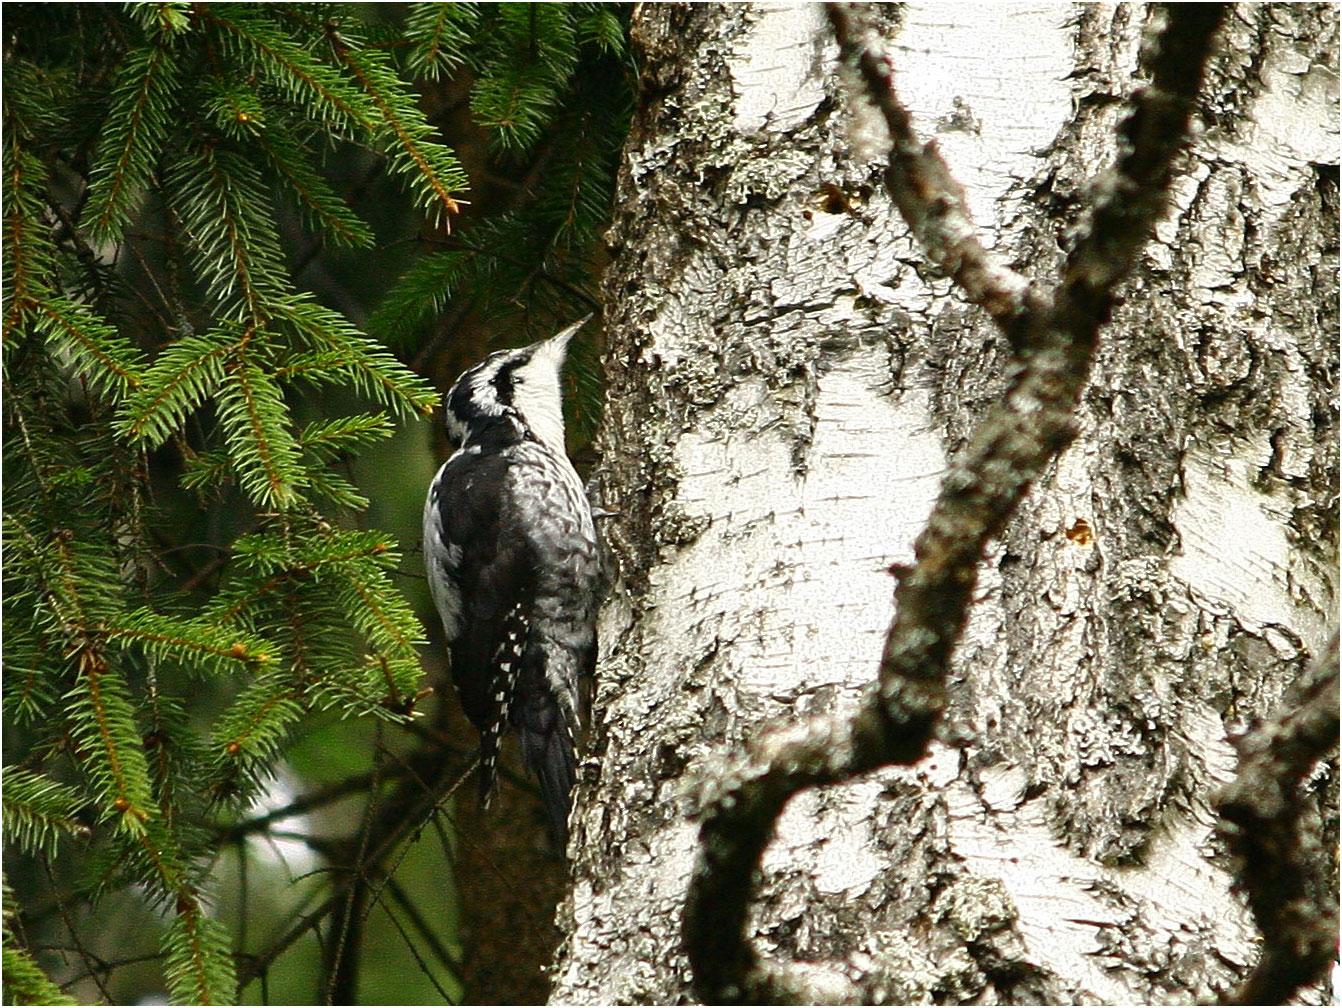 Трёхпалый дятел (Picoides tridactylus). Автор фото: